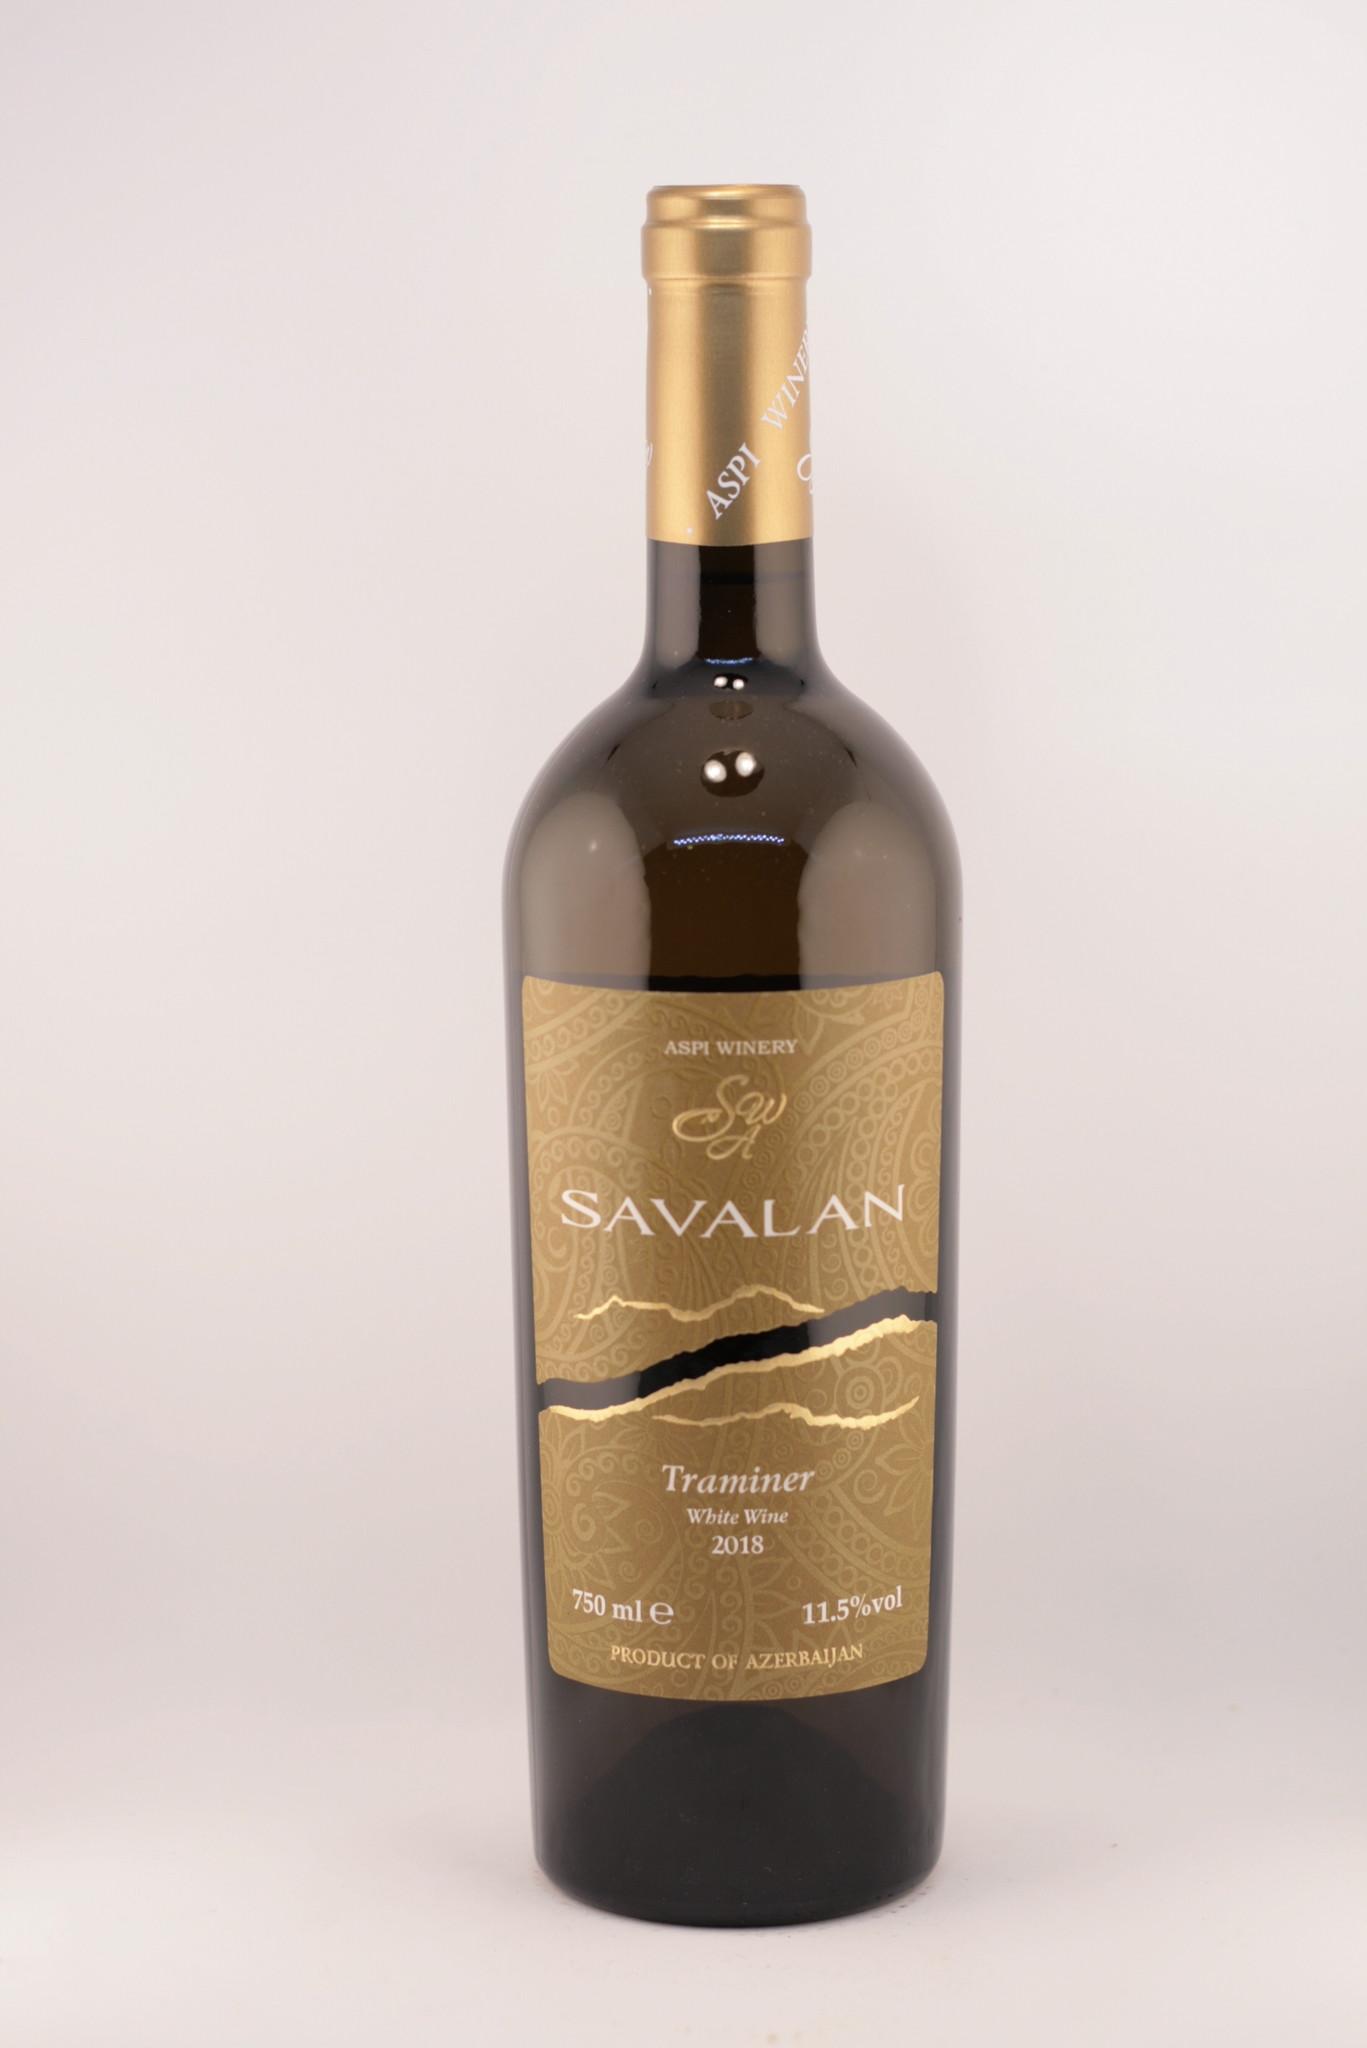 Savalan | Traminer | White dry | ASPI Winrey| 2018